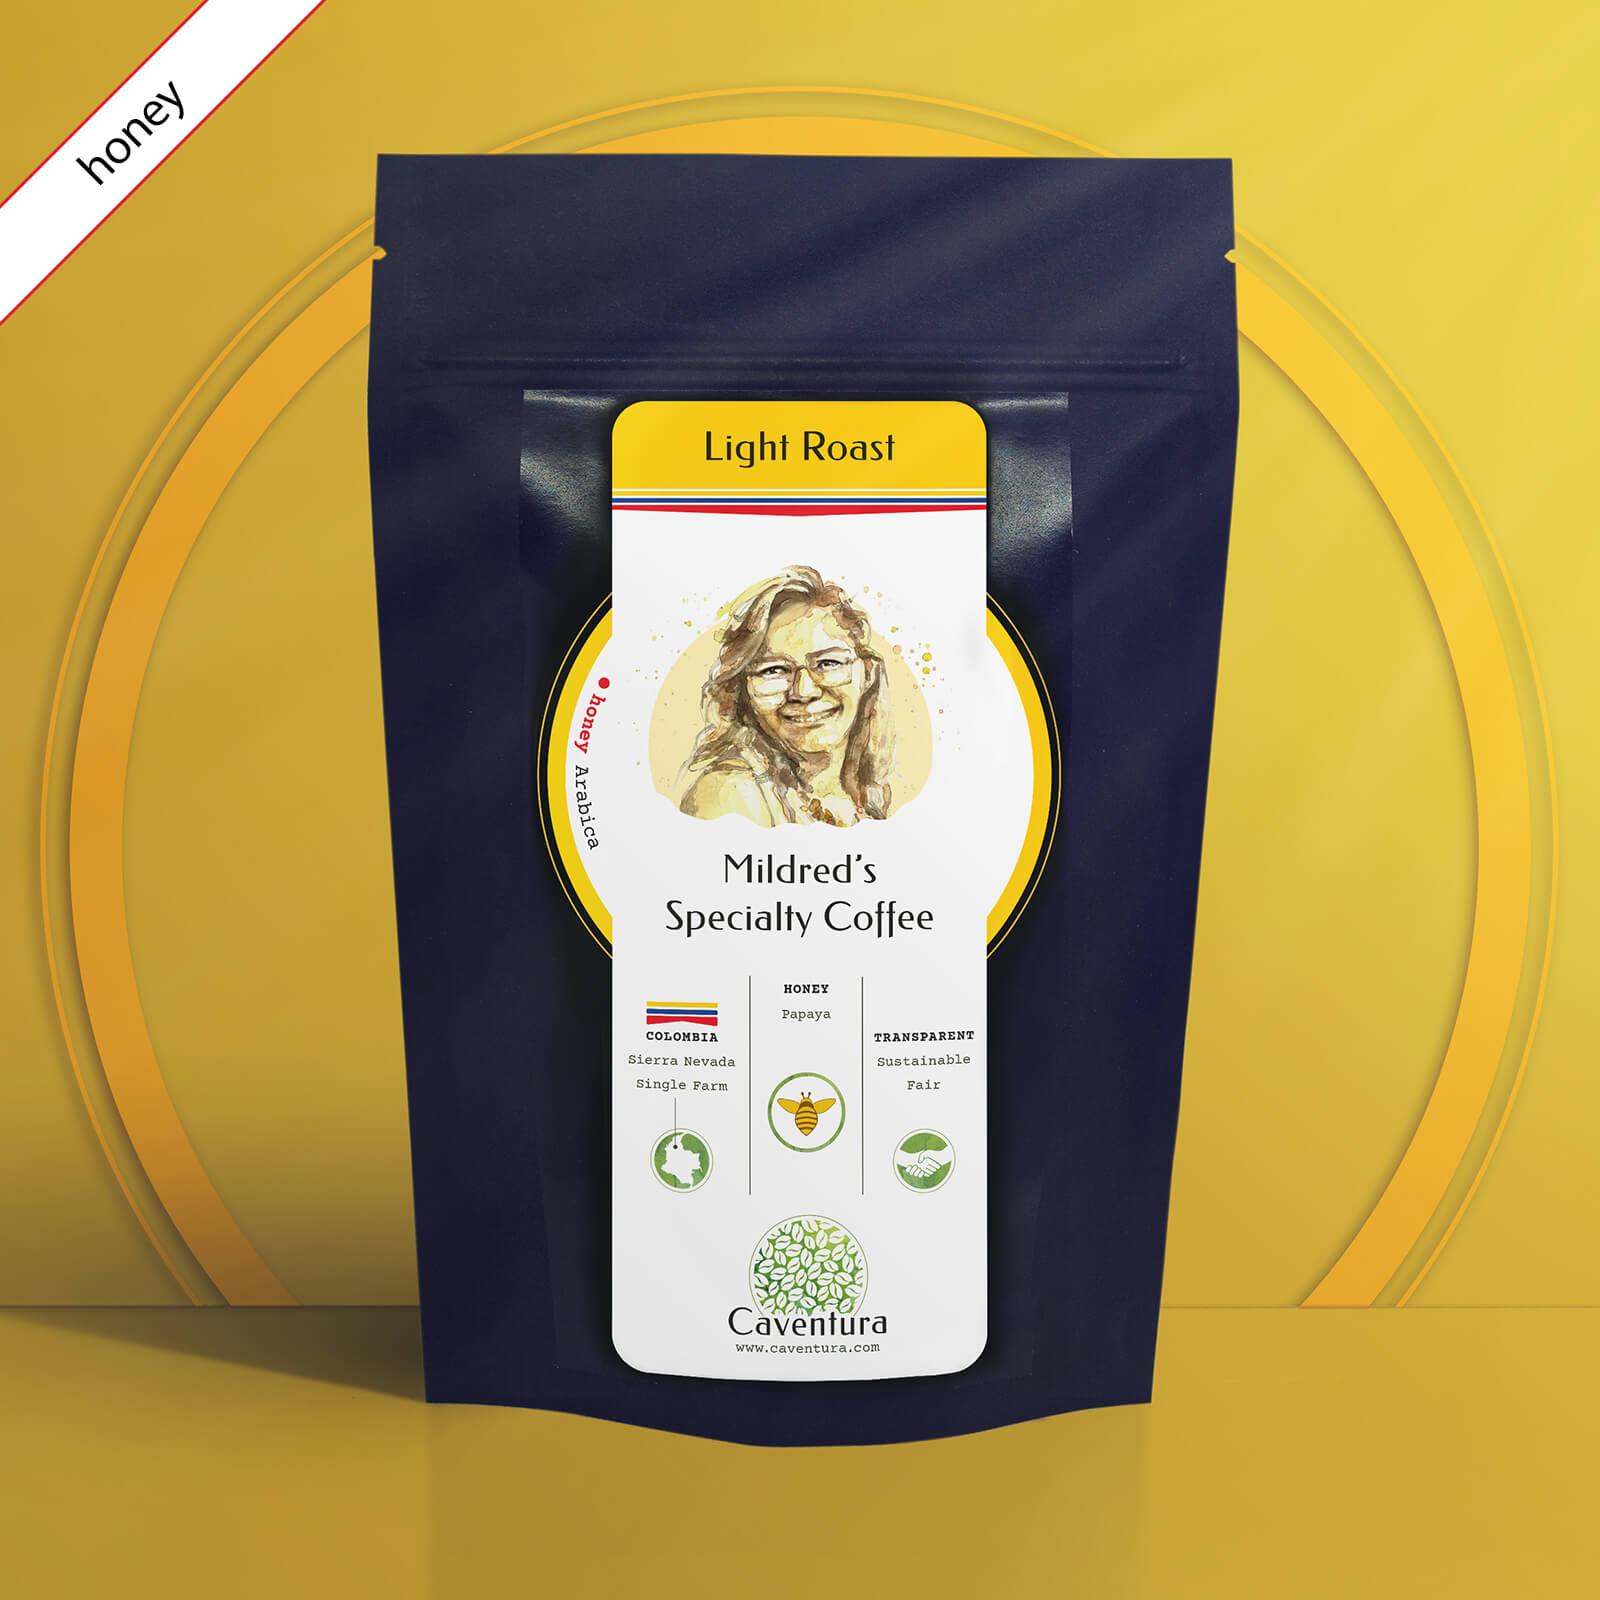 Mildred's Specialty HONEY Coffee – Light Roast